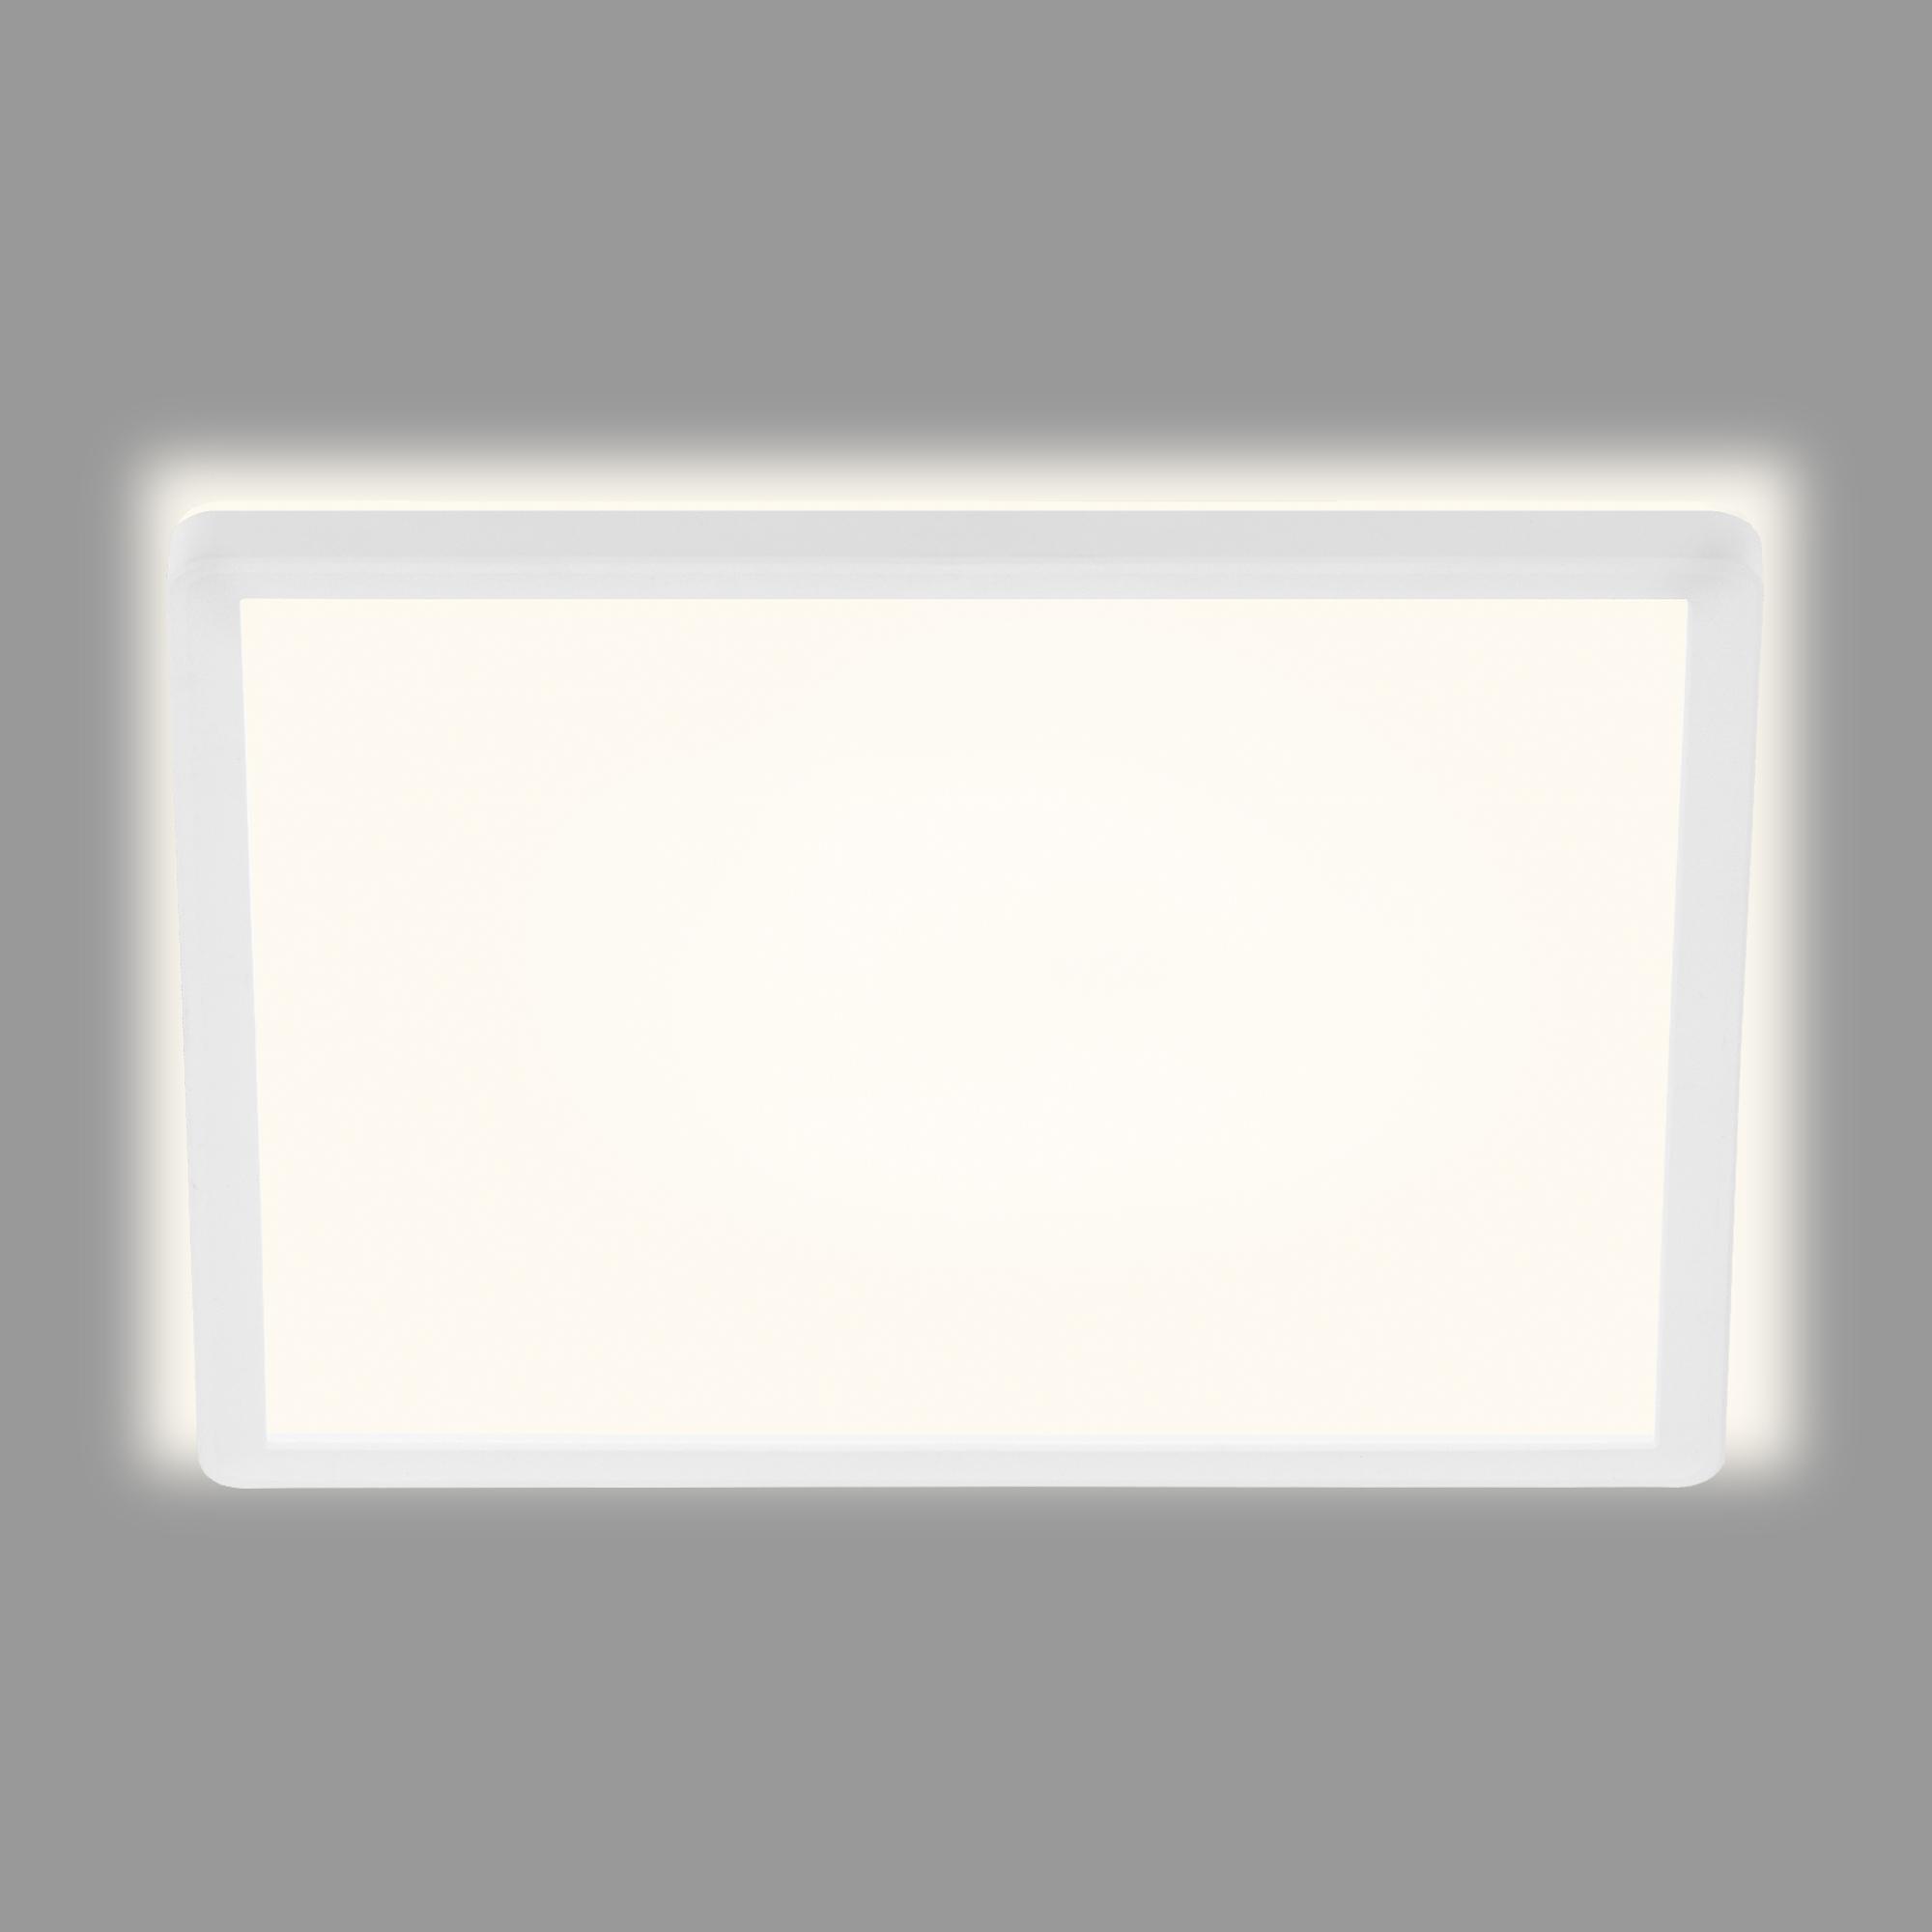 SLIM LED Panel, 29,3 cm, 2400 LUMEN, 18 WATT, Weiss